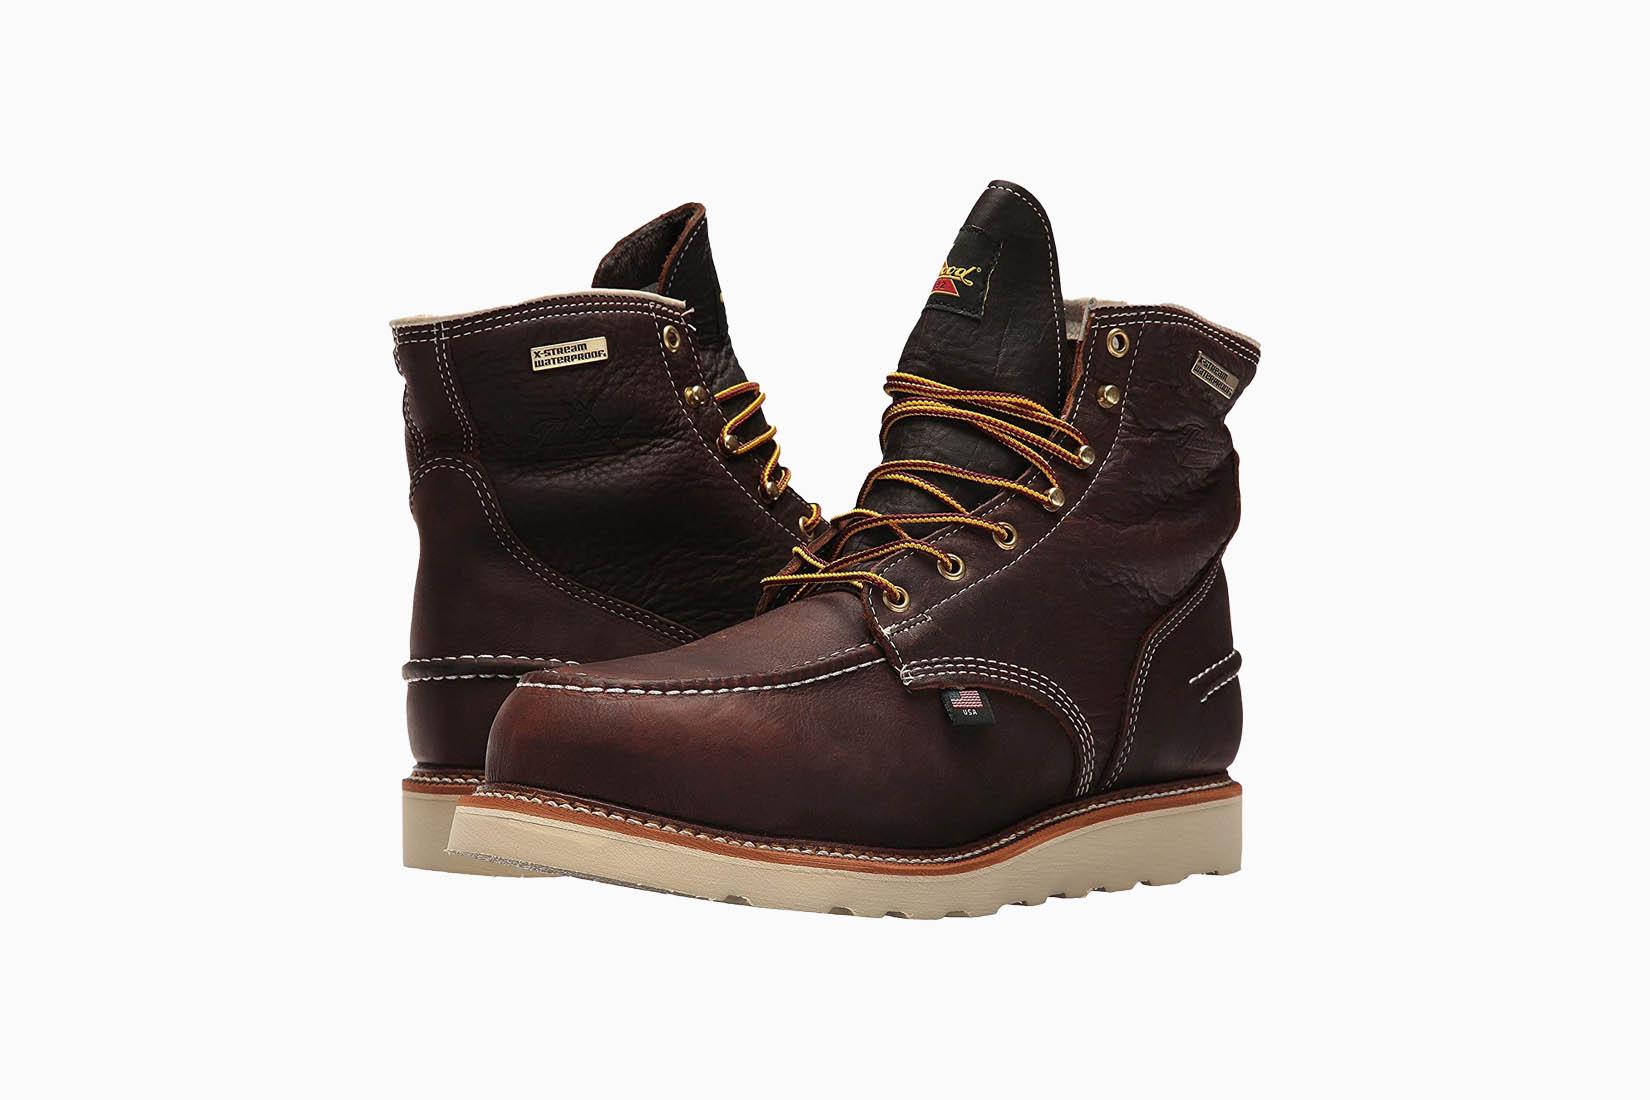 best work boots men thorogood review Luxe Digital